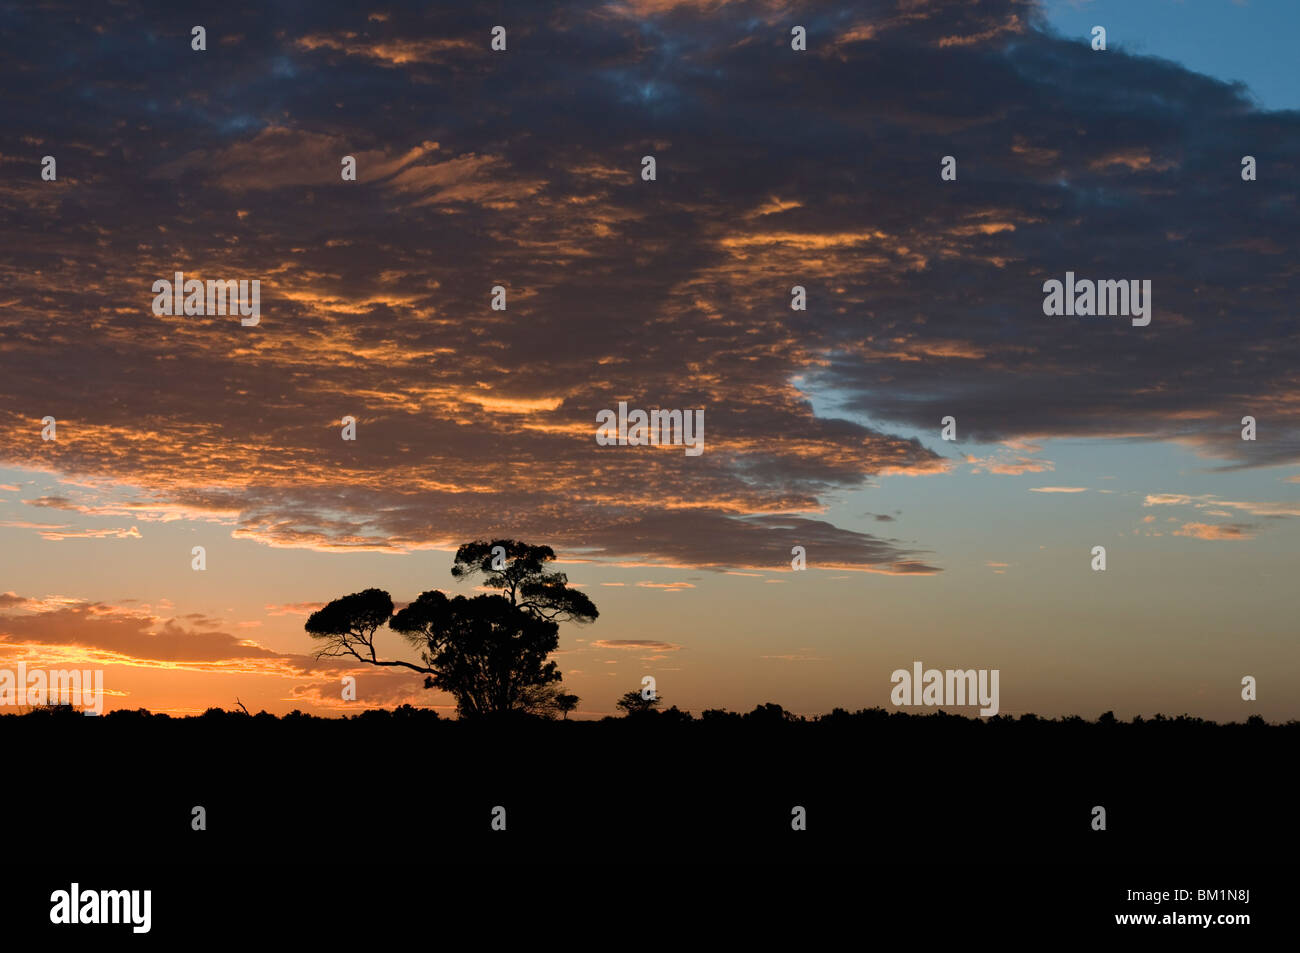 Amanecer, Reserva Nacional de Masai Mara, Kenia, África oriental, África Imagen De Stock